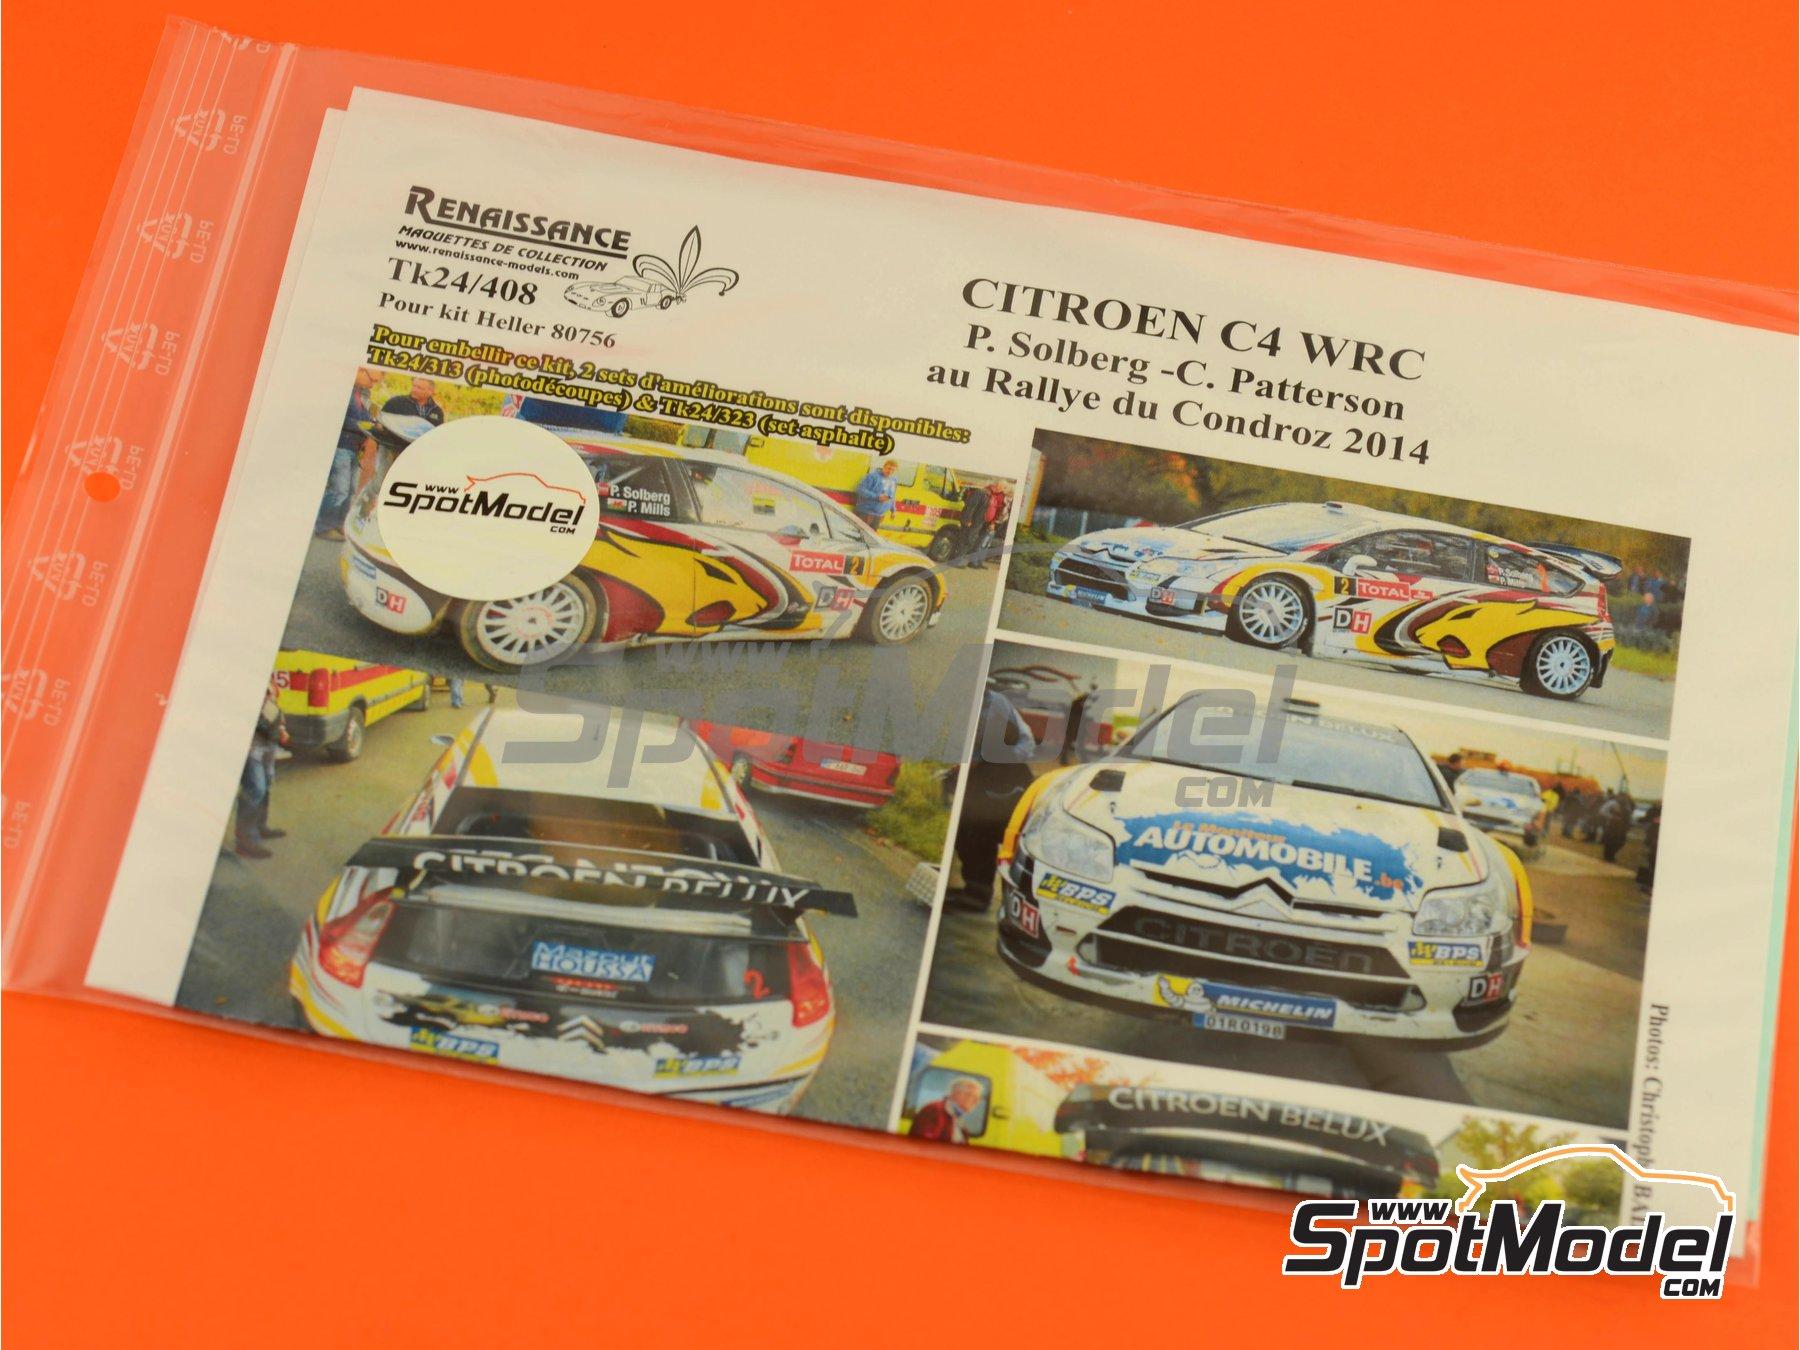 Image 2: Citroen C4 WRC Marc VDS - Rally Condroz de Bélgica 2014   Calcas de agua en escala1/24 fabricado por Renaissance Models (ref.TK24-408)